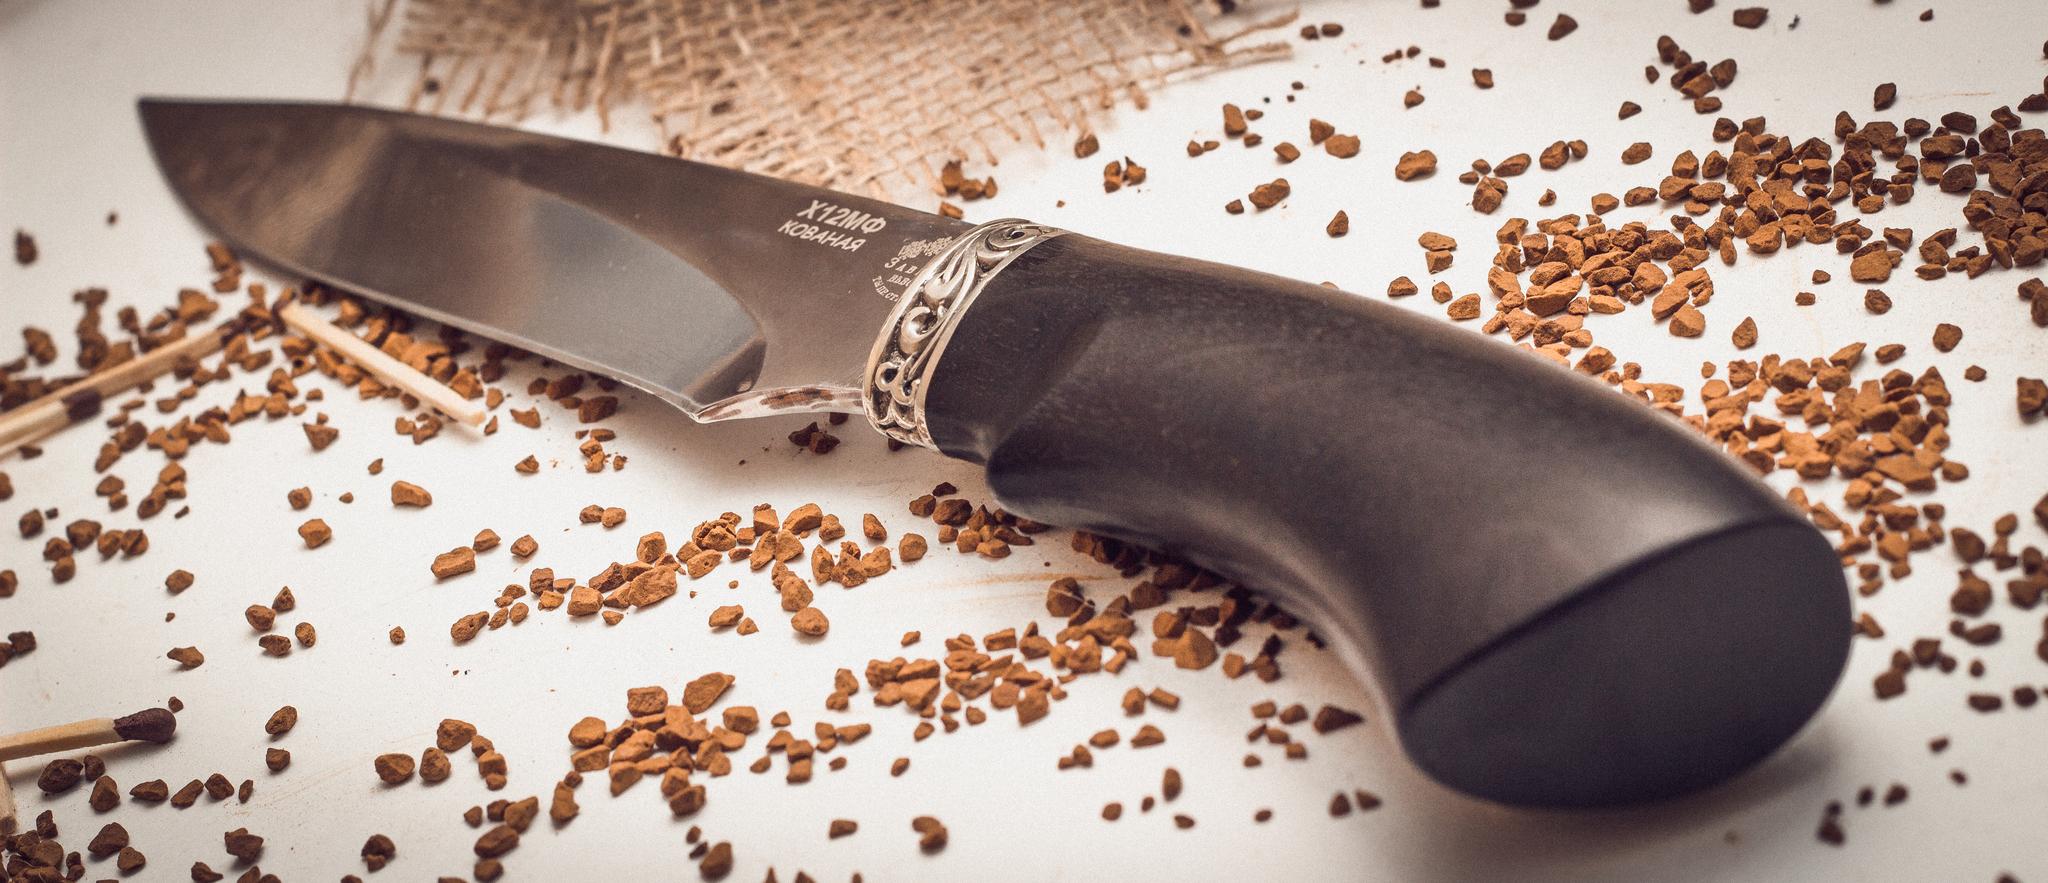 Фото 4 - Нож Акула, кованый Х12МФ,  черный граб от Кузница Завьялова